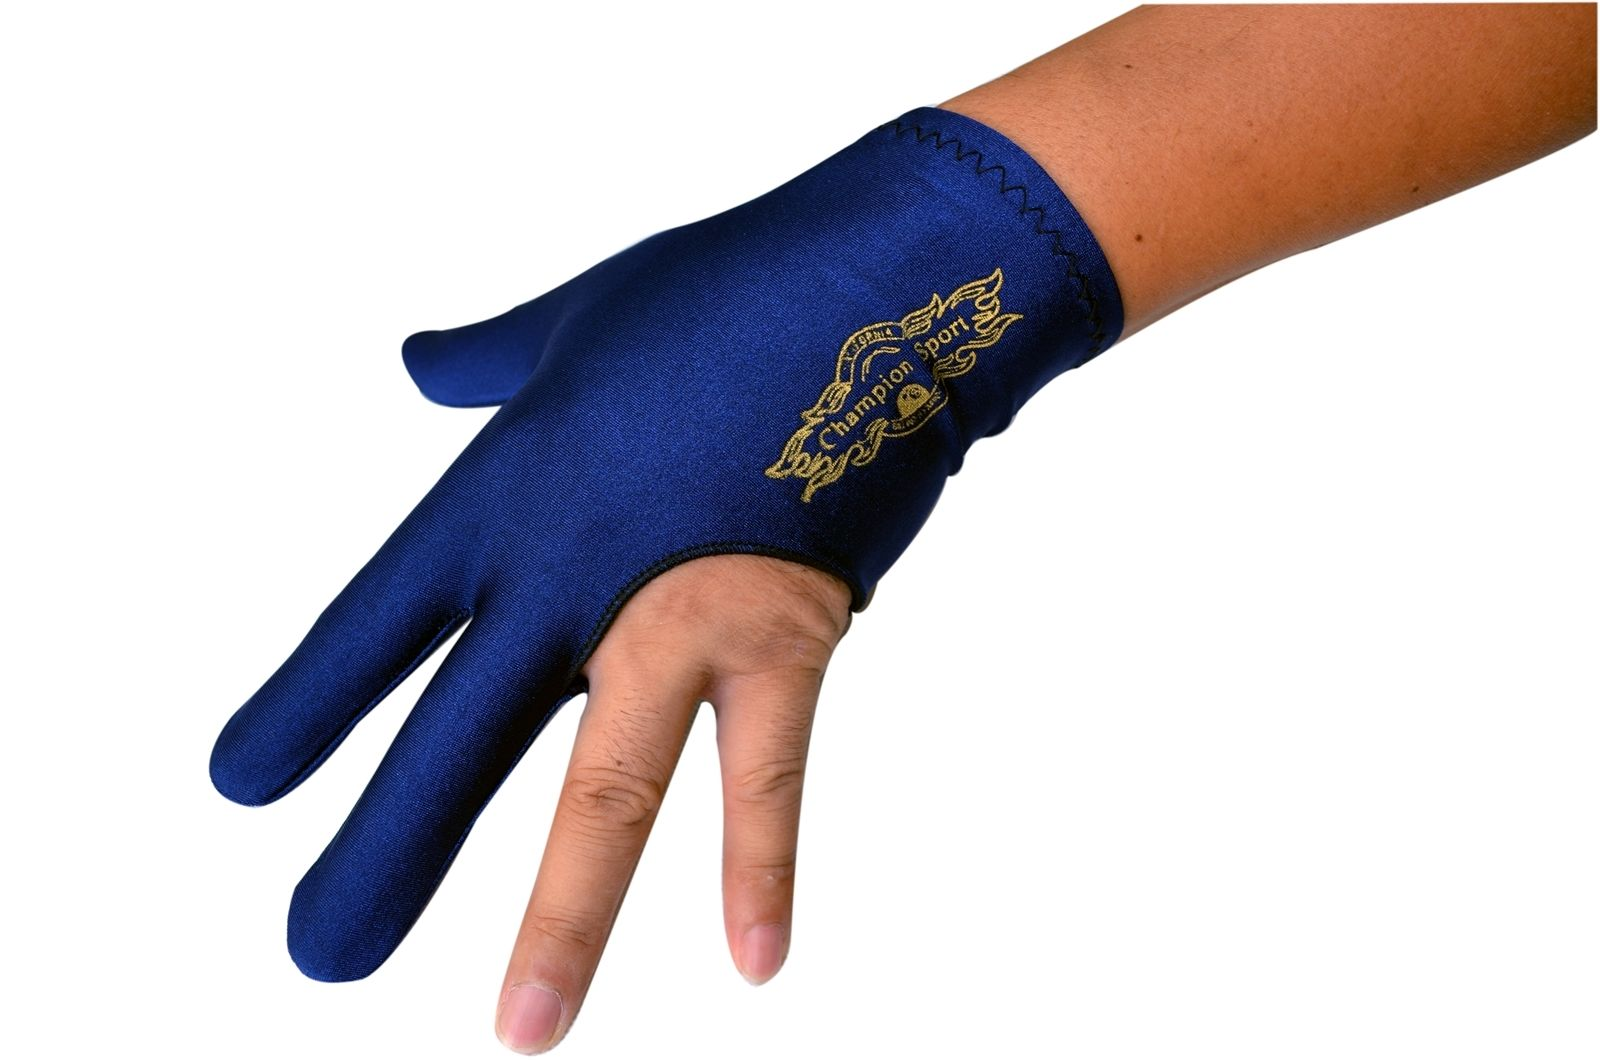 Champion Sport Dark Blue Billiards Left Hand Glove For Pool Cue by